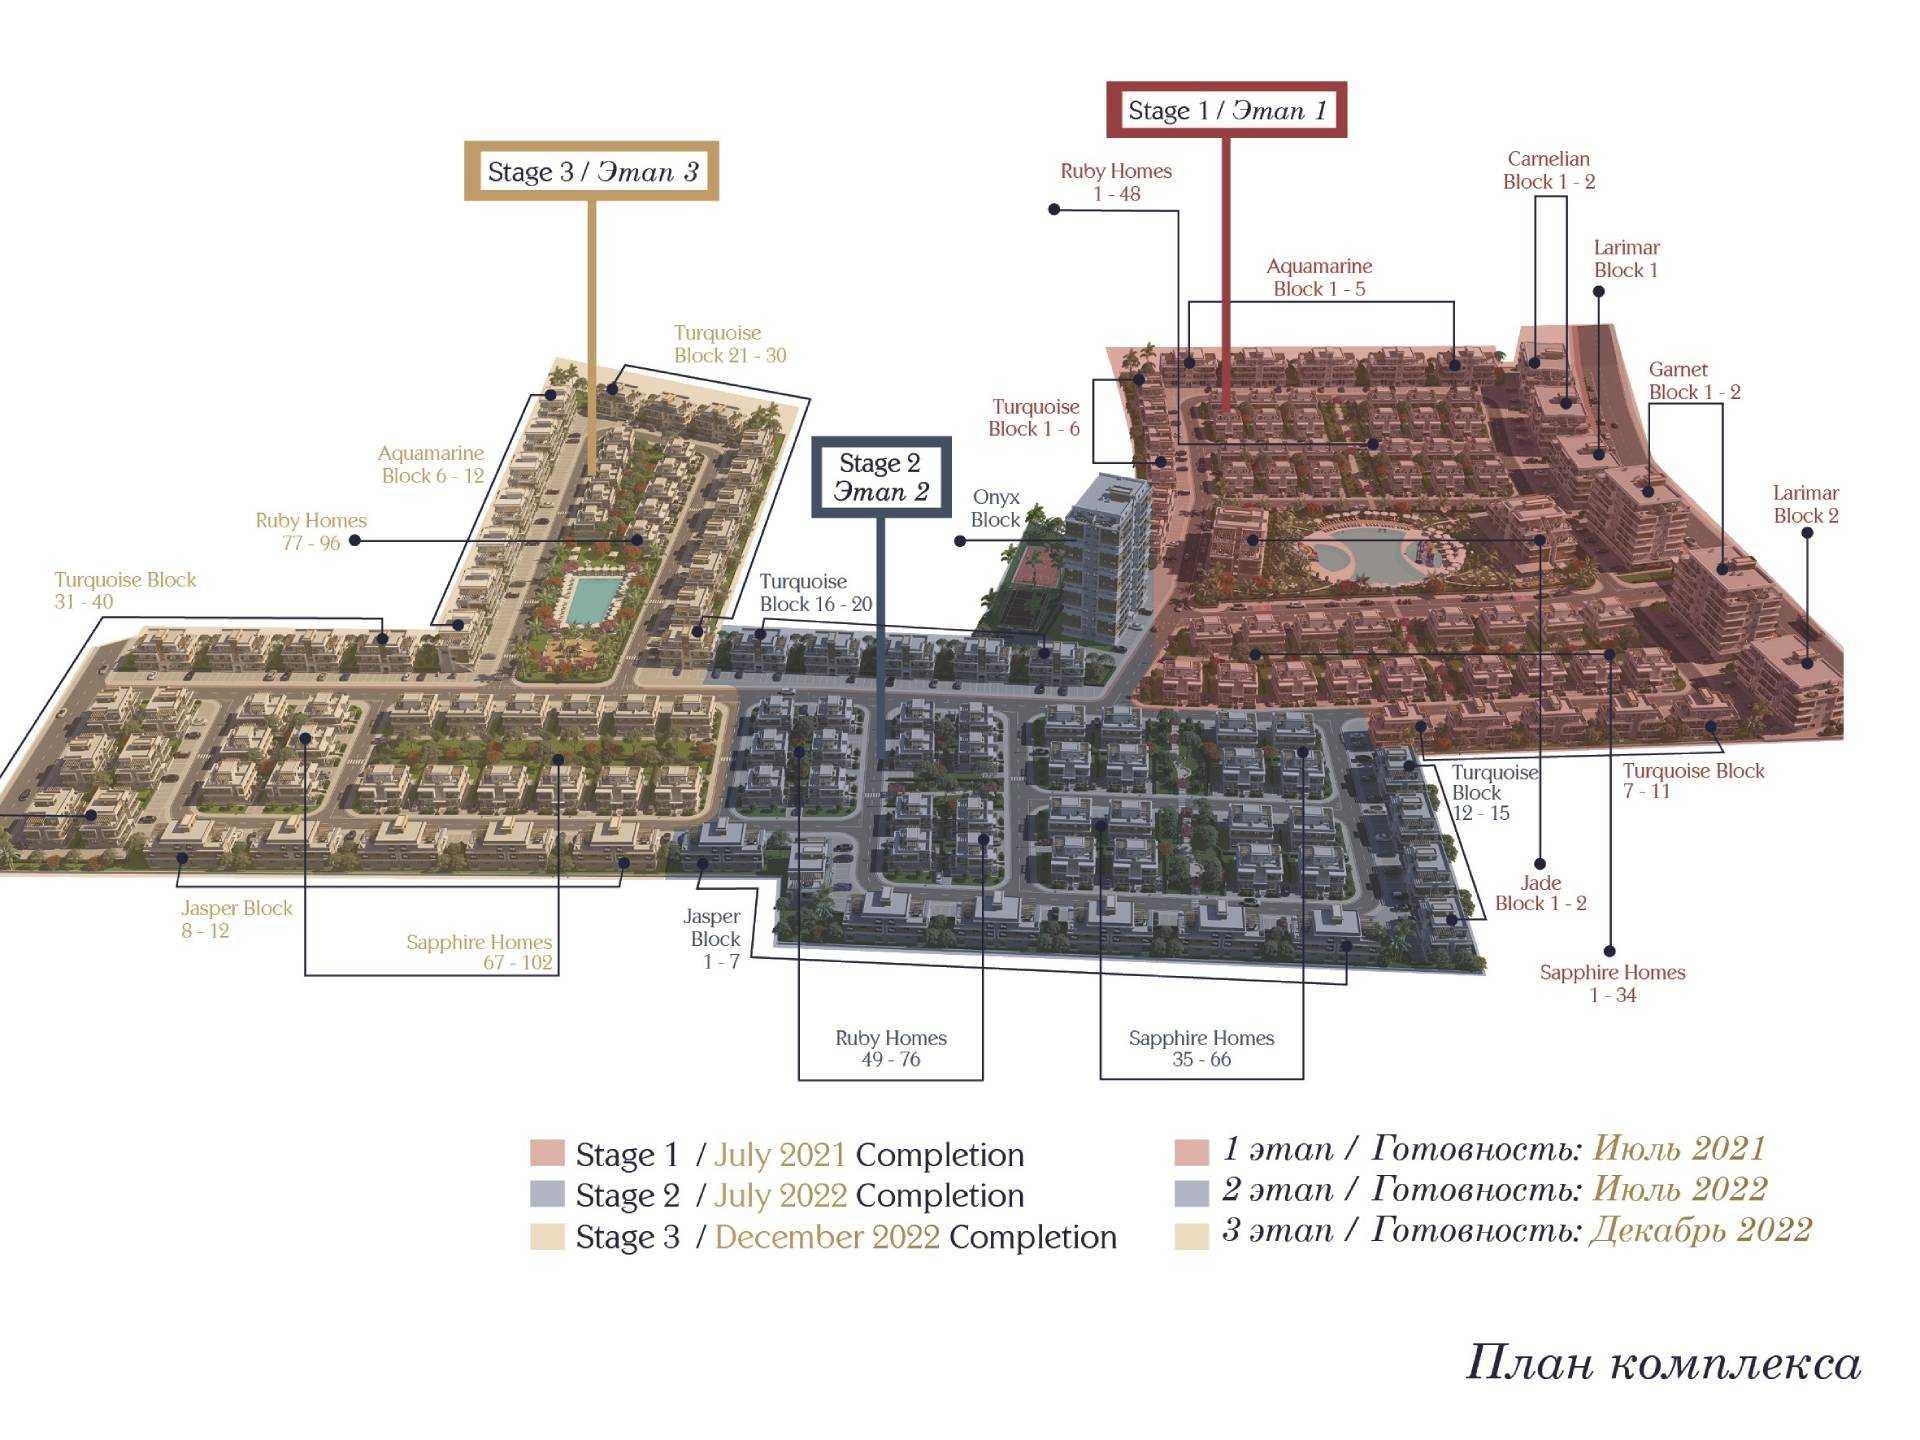 Construction plan